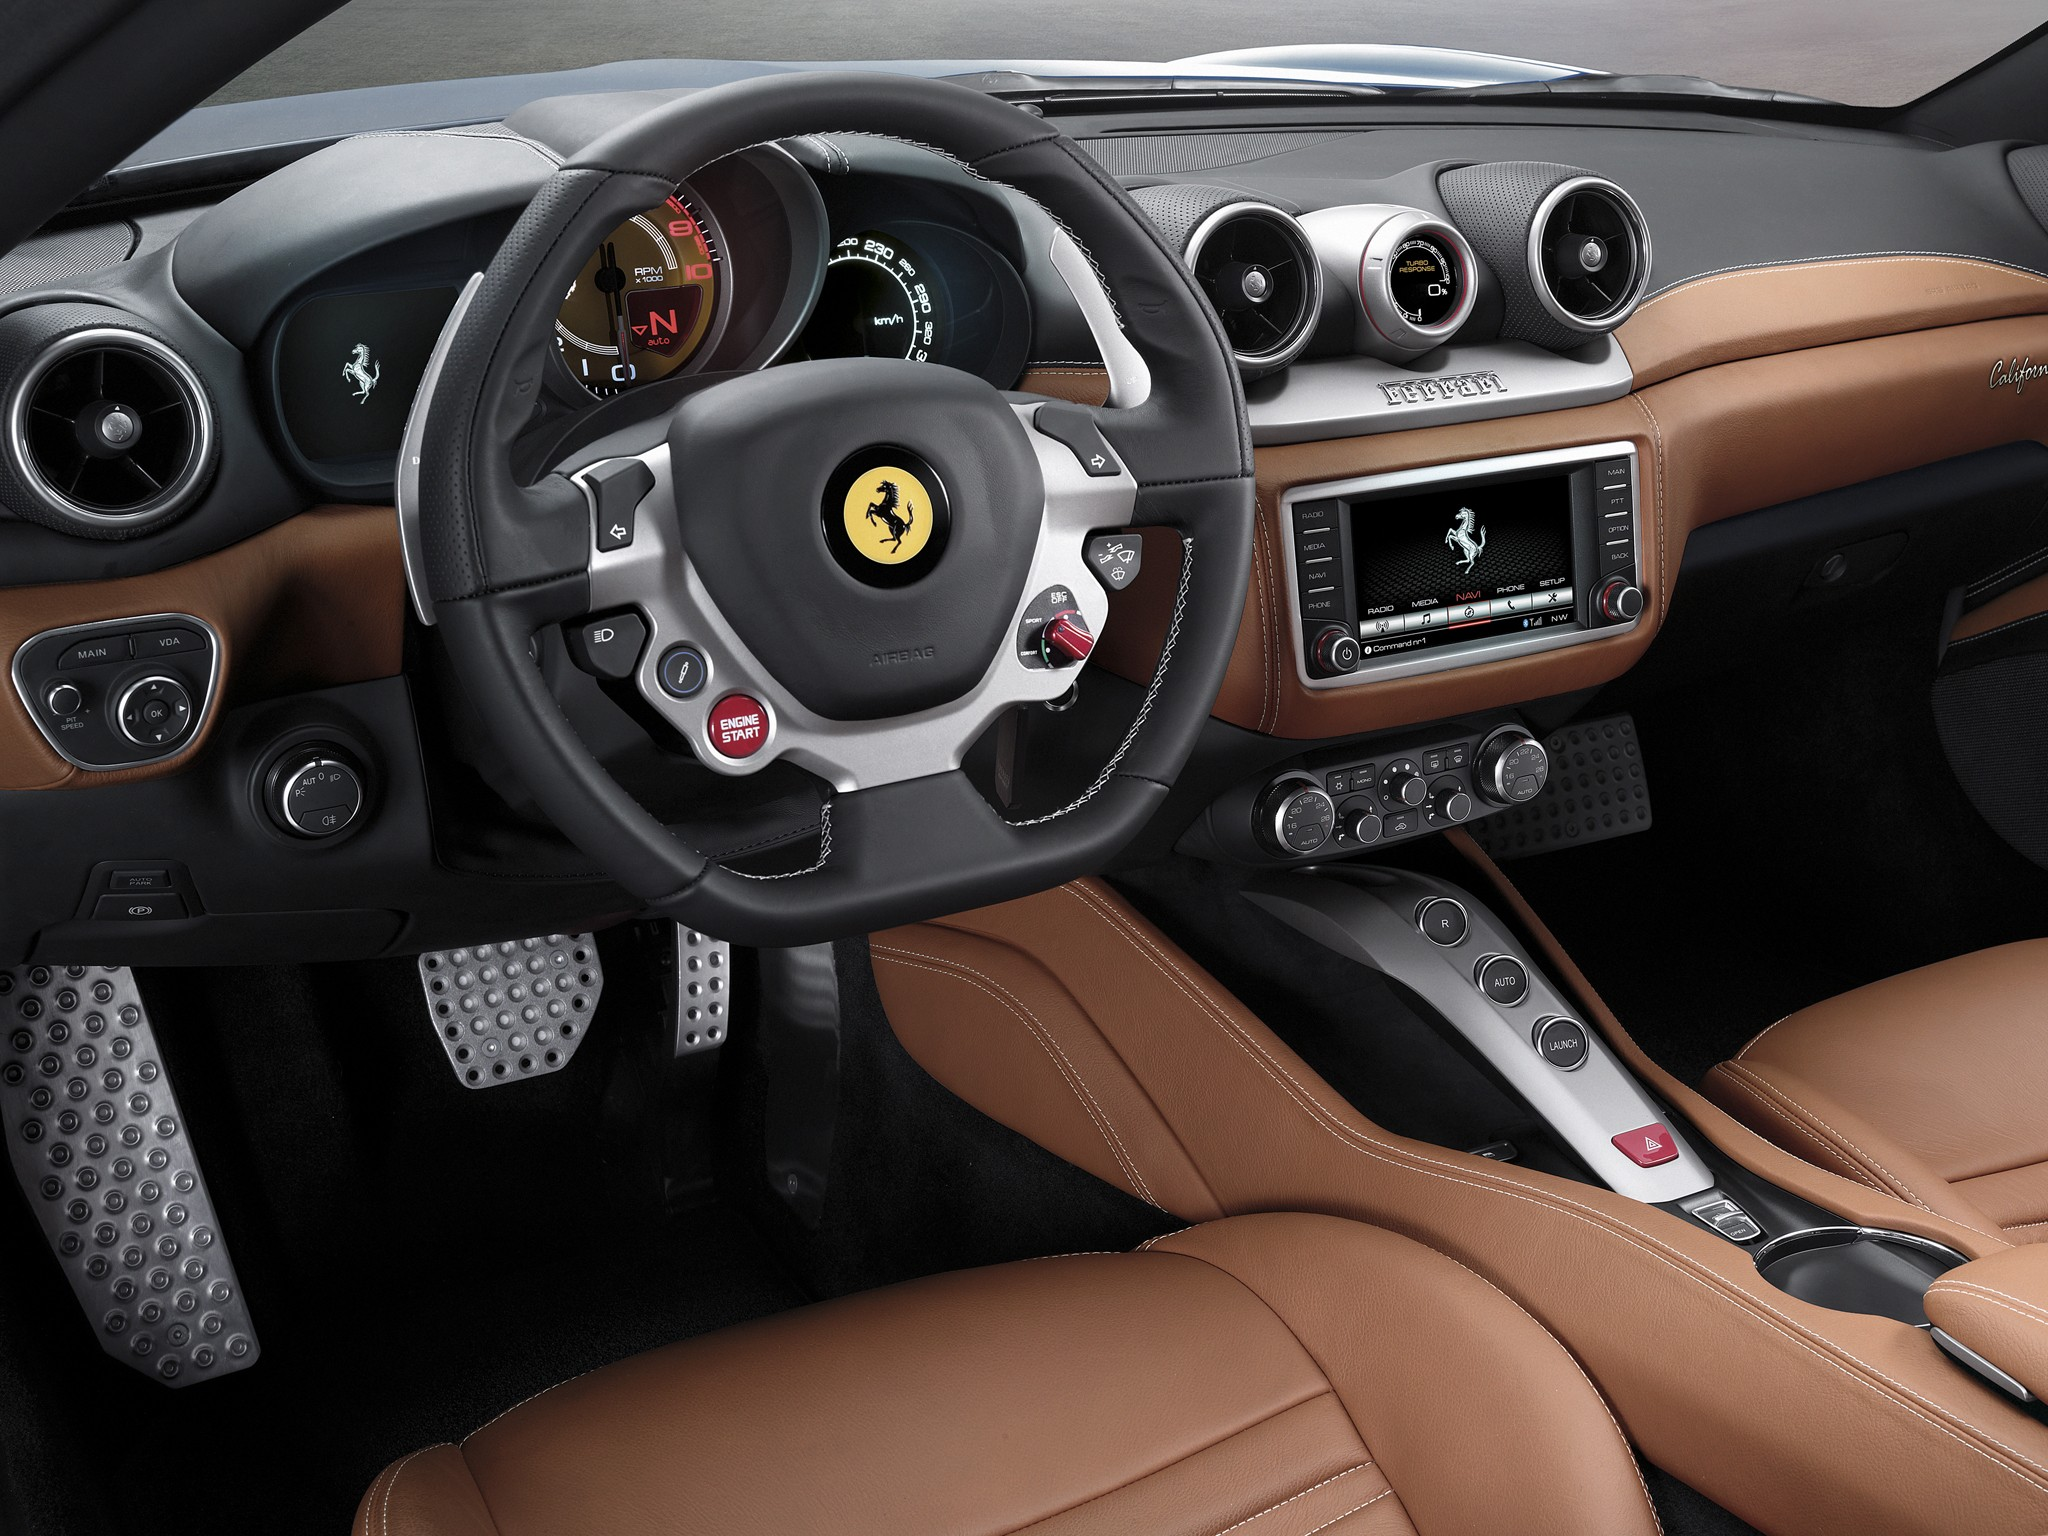 Ferrari California T Spezifikationen Fotos 2014 2015 2016 2017 Autoevolution In Deutscher Sprache